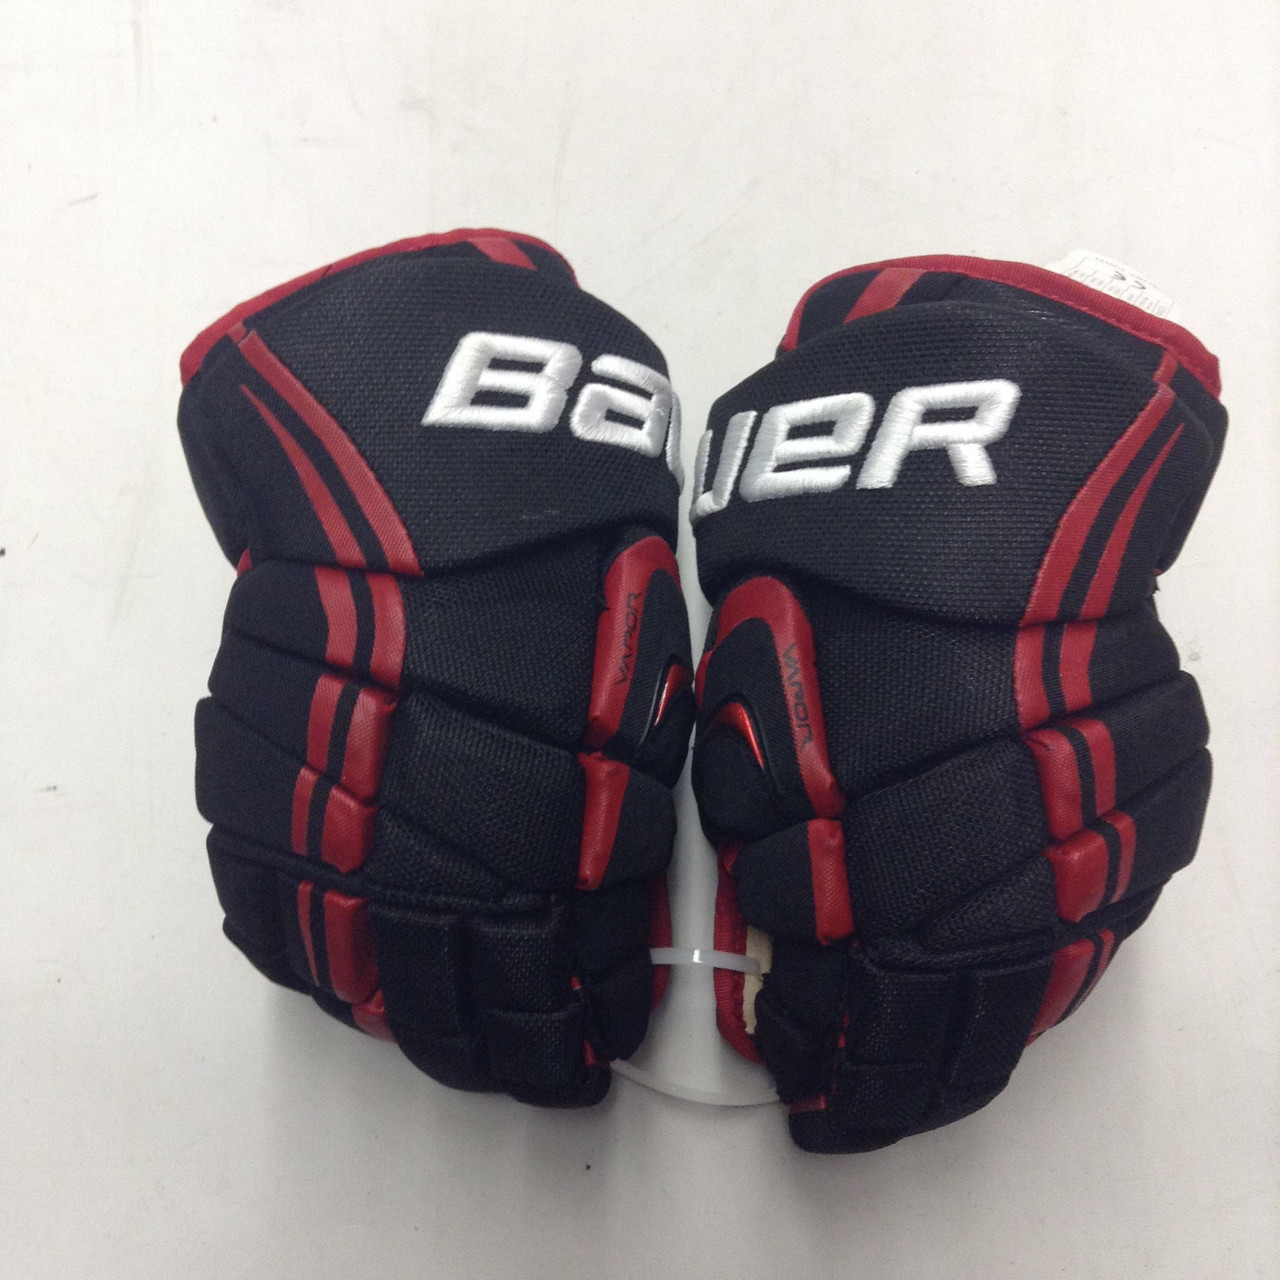 Bauer Vapor APX Pro Stock Custom Hockey Gloves 12